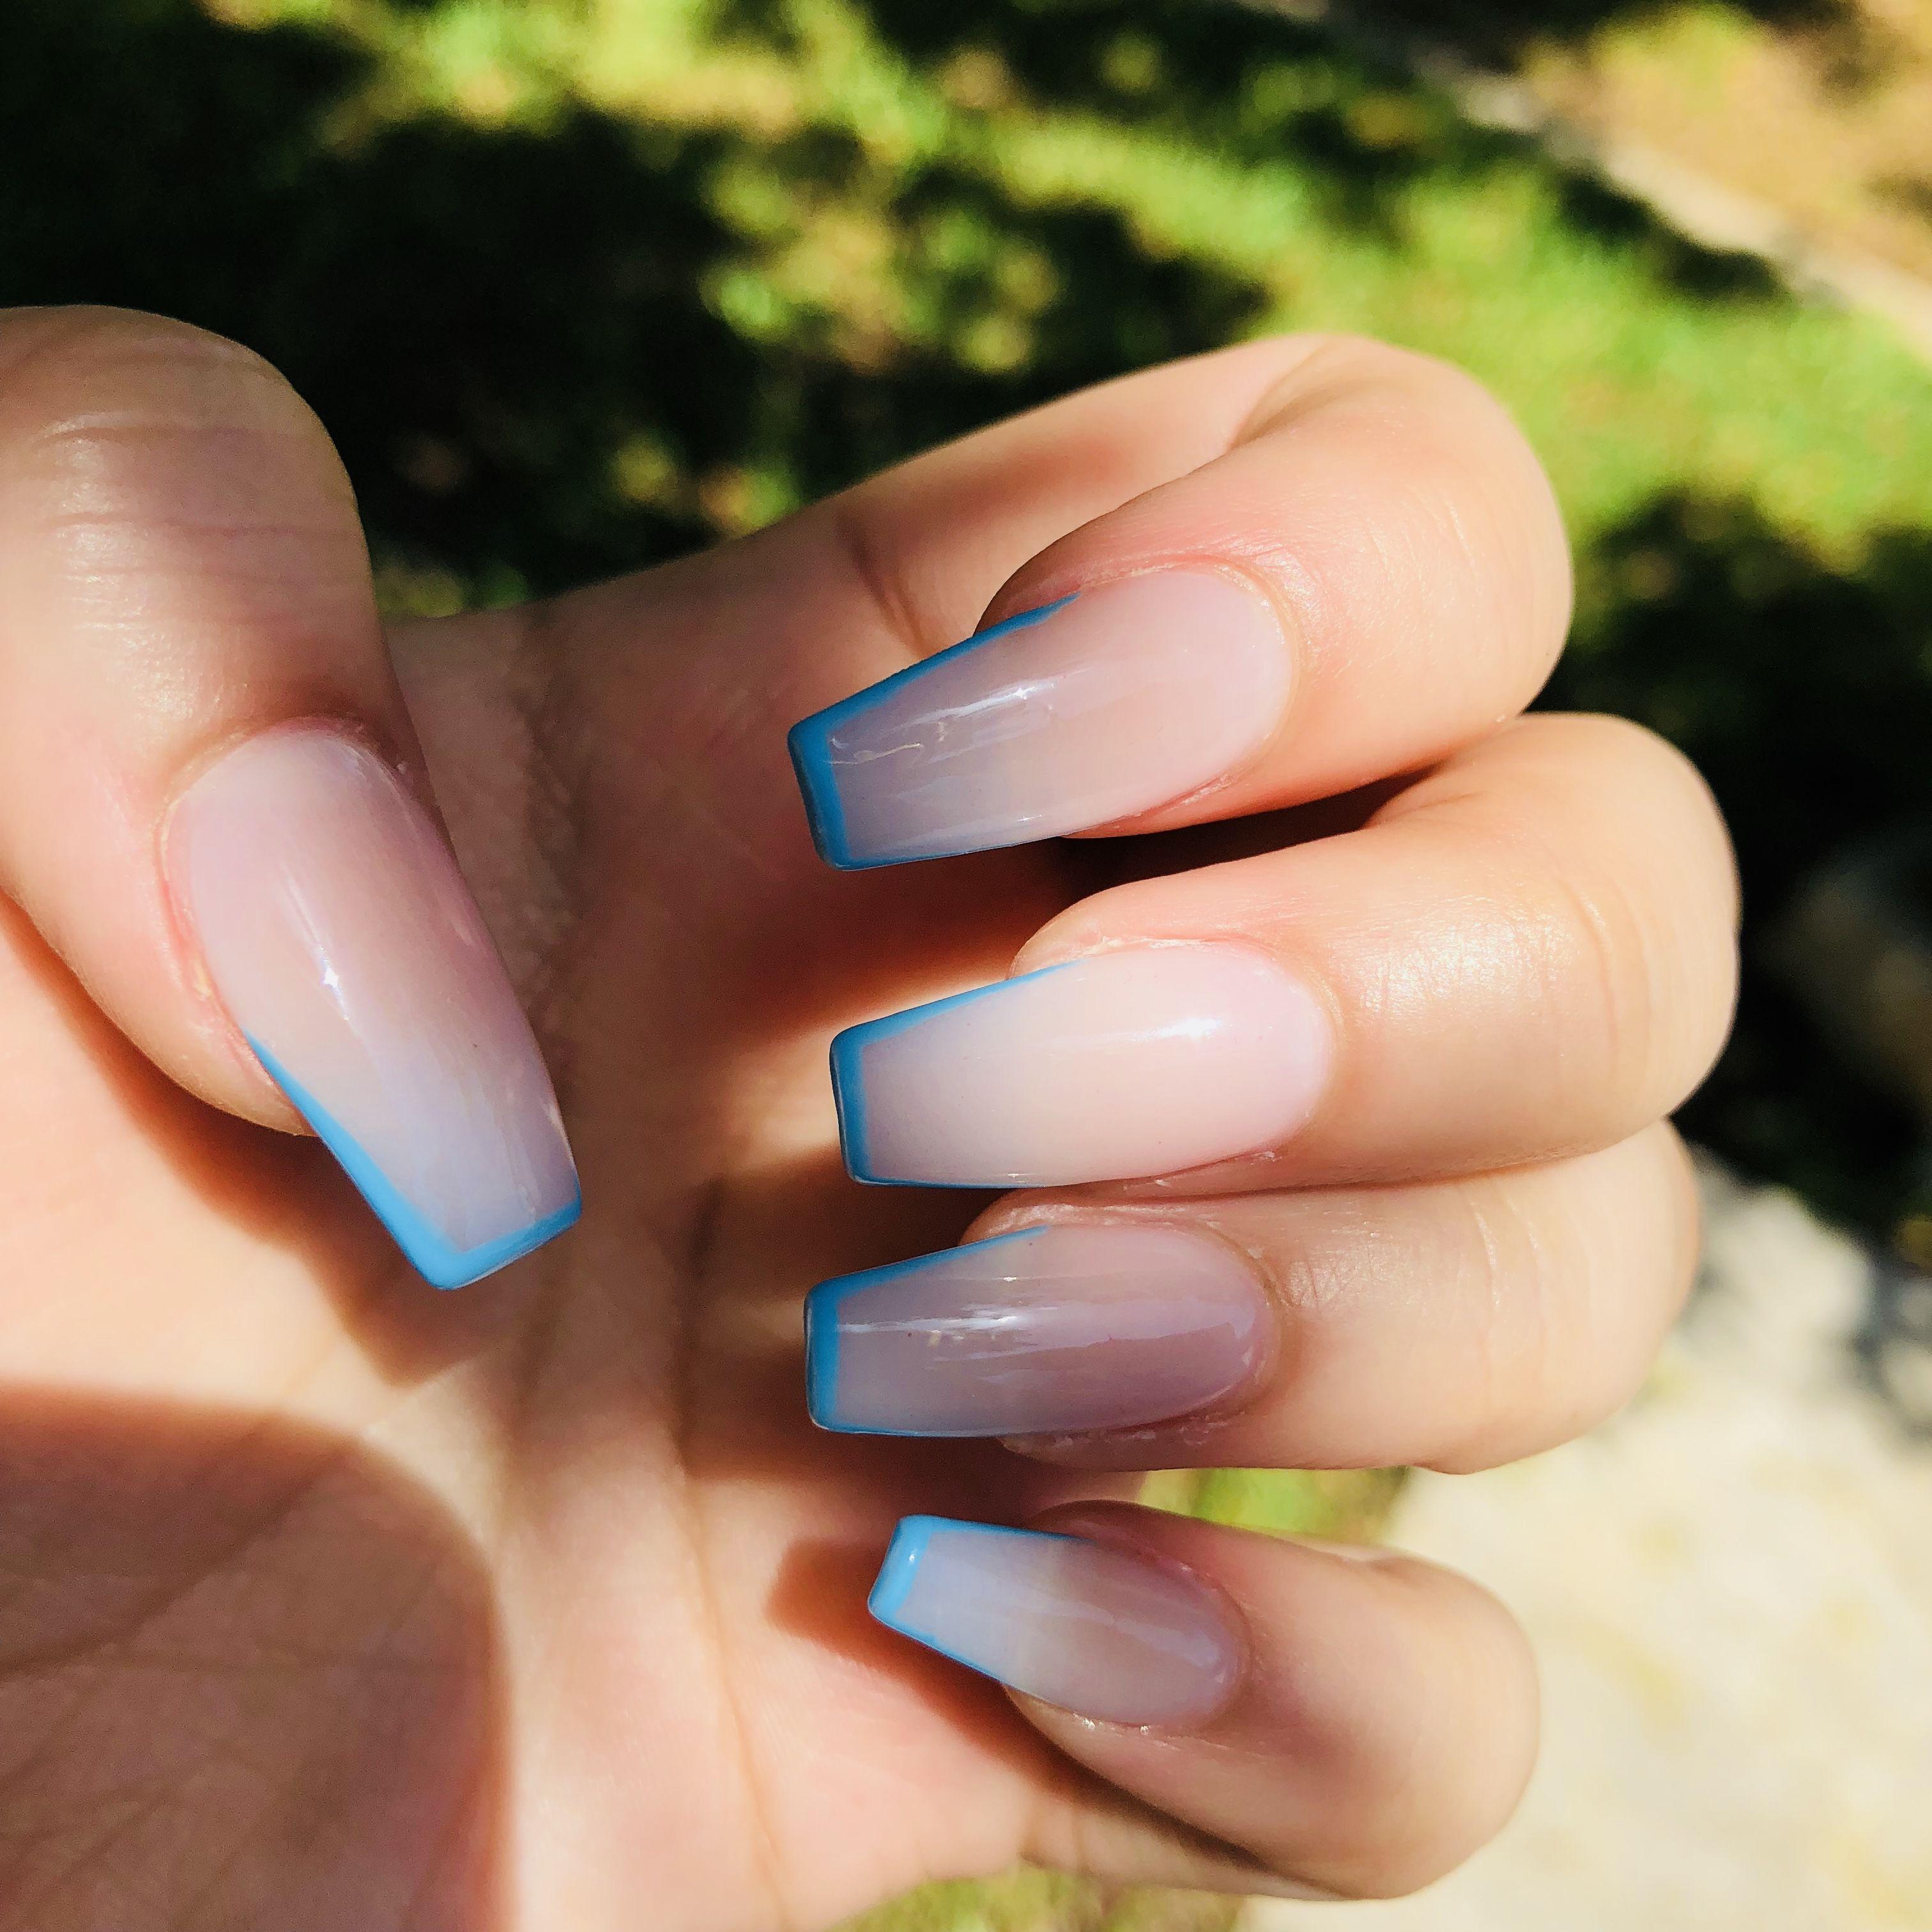 Acrylic Nails Light Blue Gel Outline Design Blue Acrylic Nails Pink Acrylic Nails Coffin